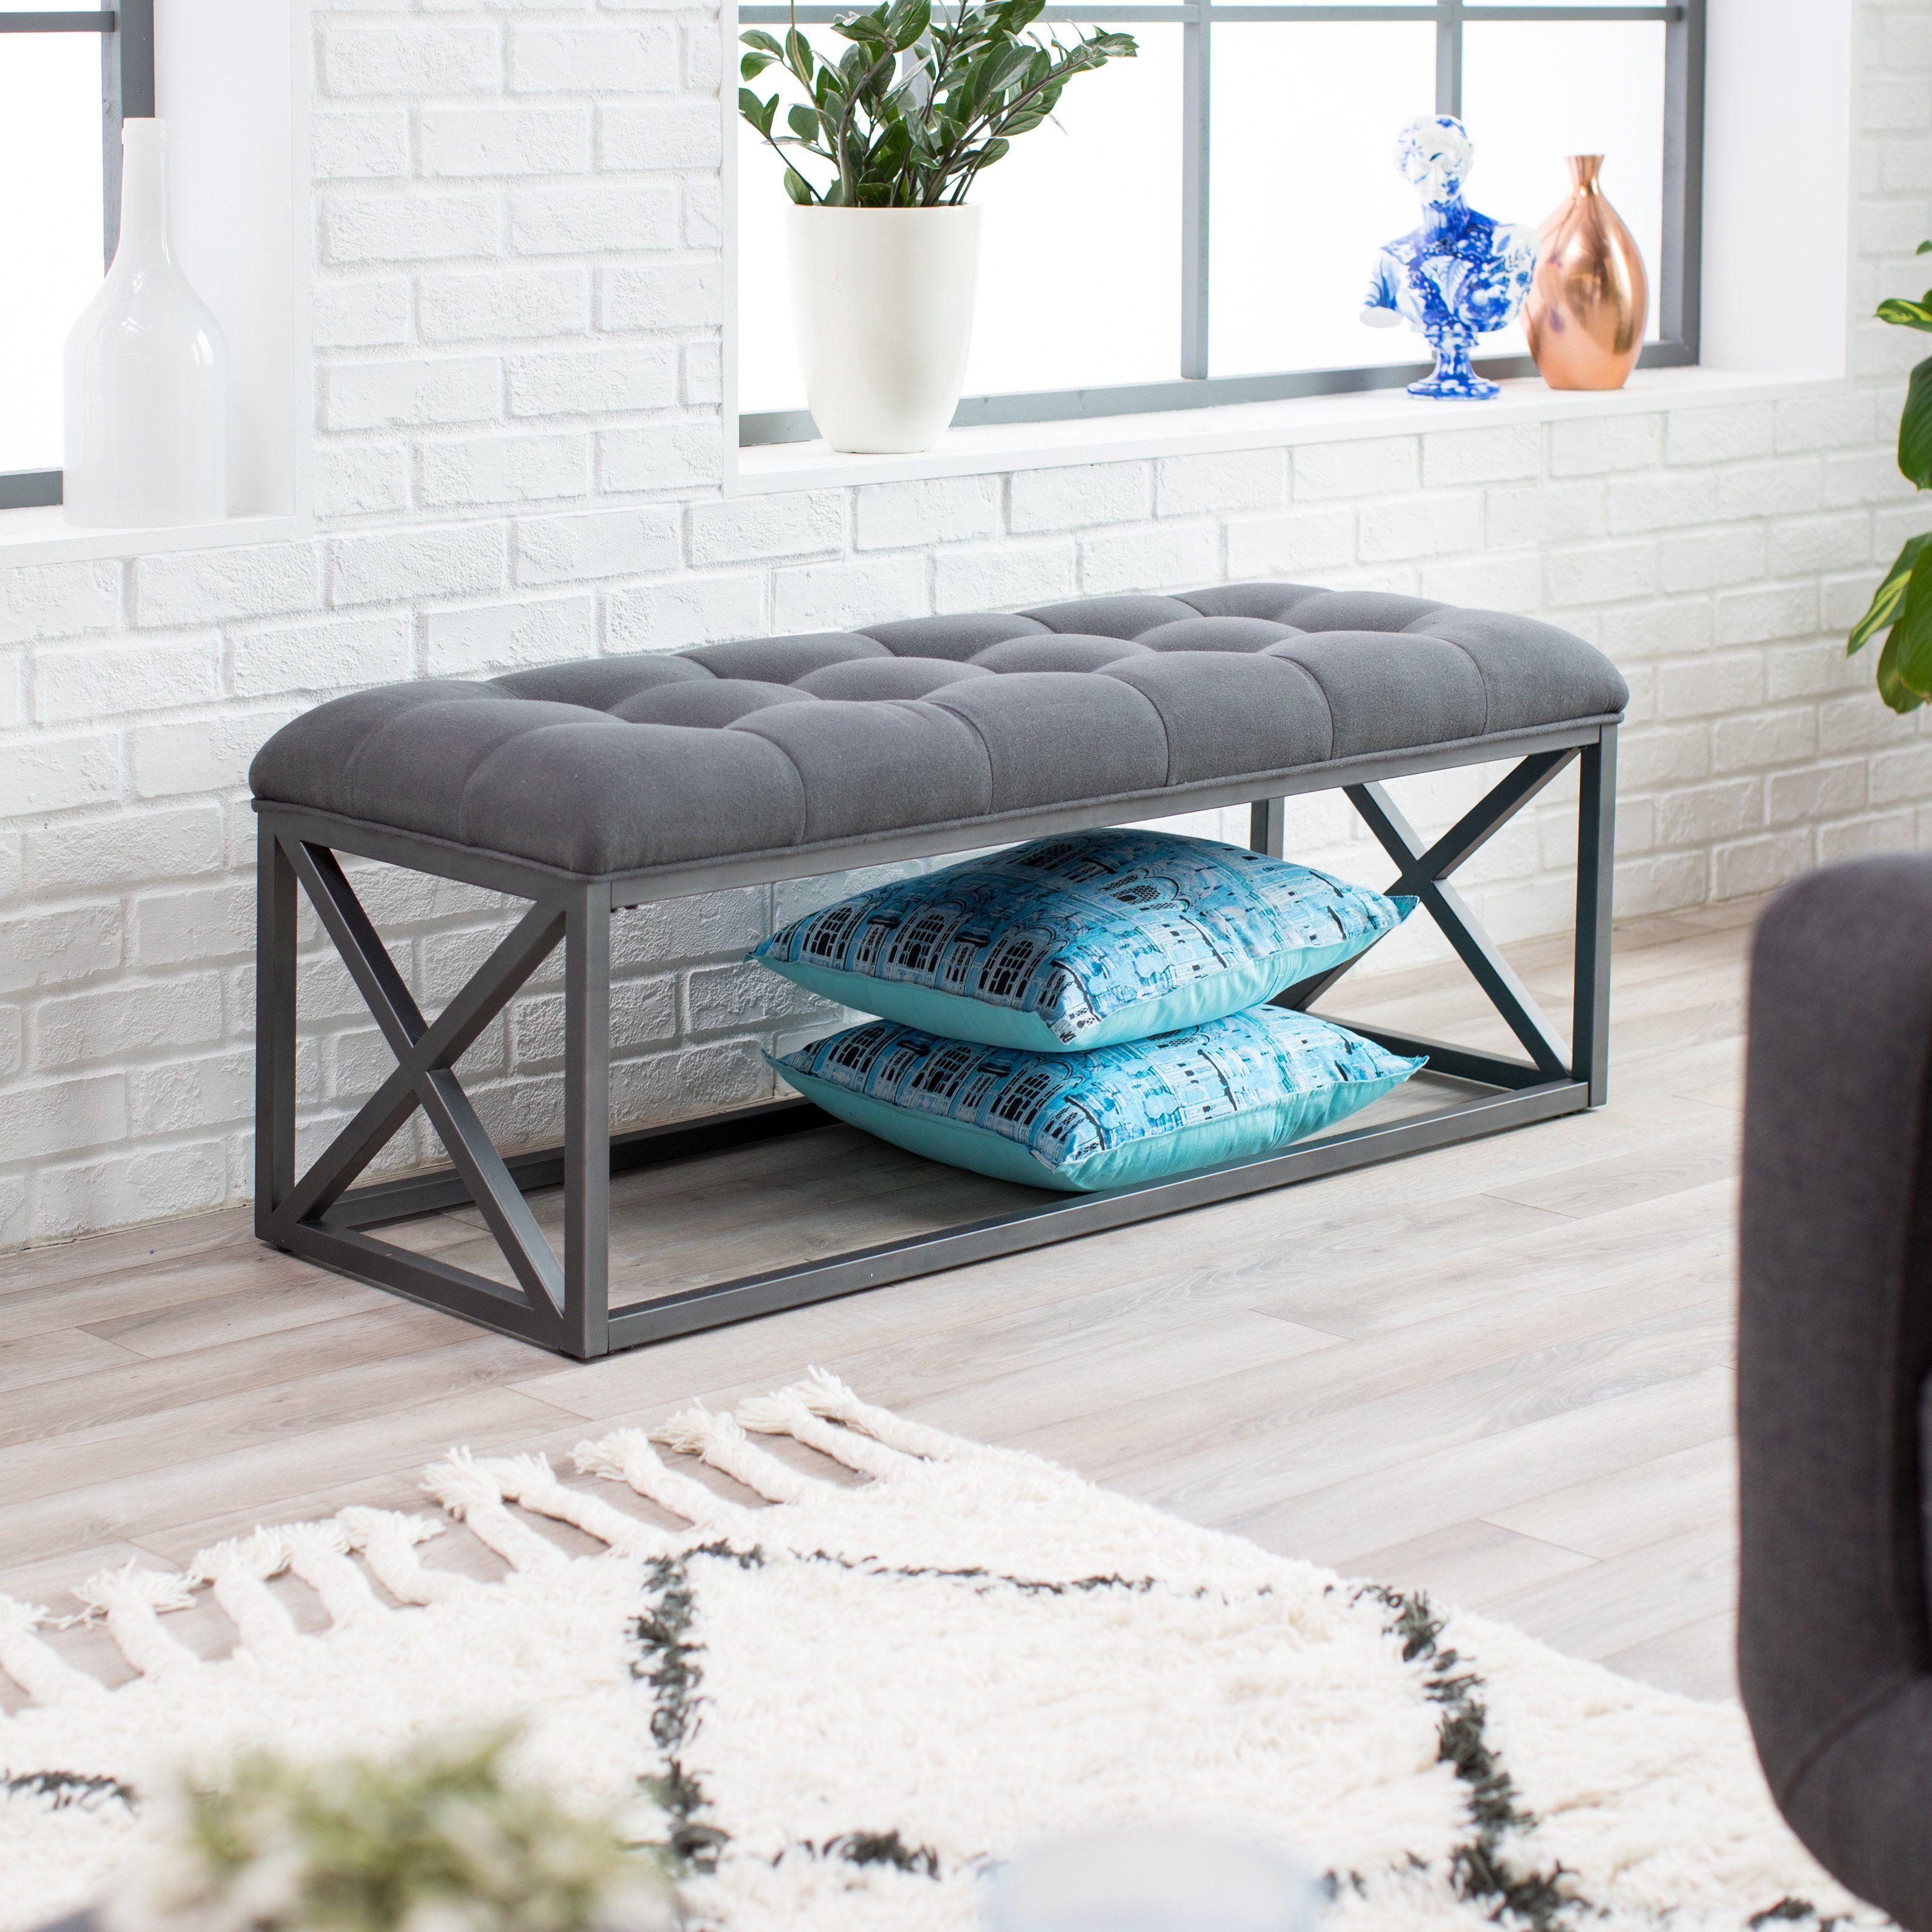 Belham Living Grayson Tufted Backless Bench 6640b M111 647 Elegant Living Room Decor Living Room Bench